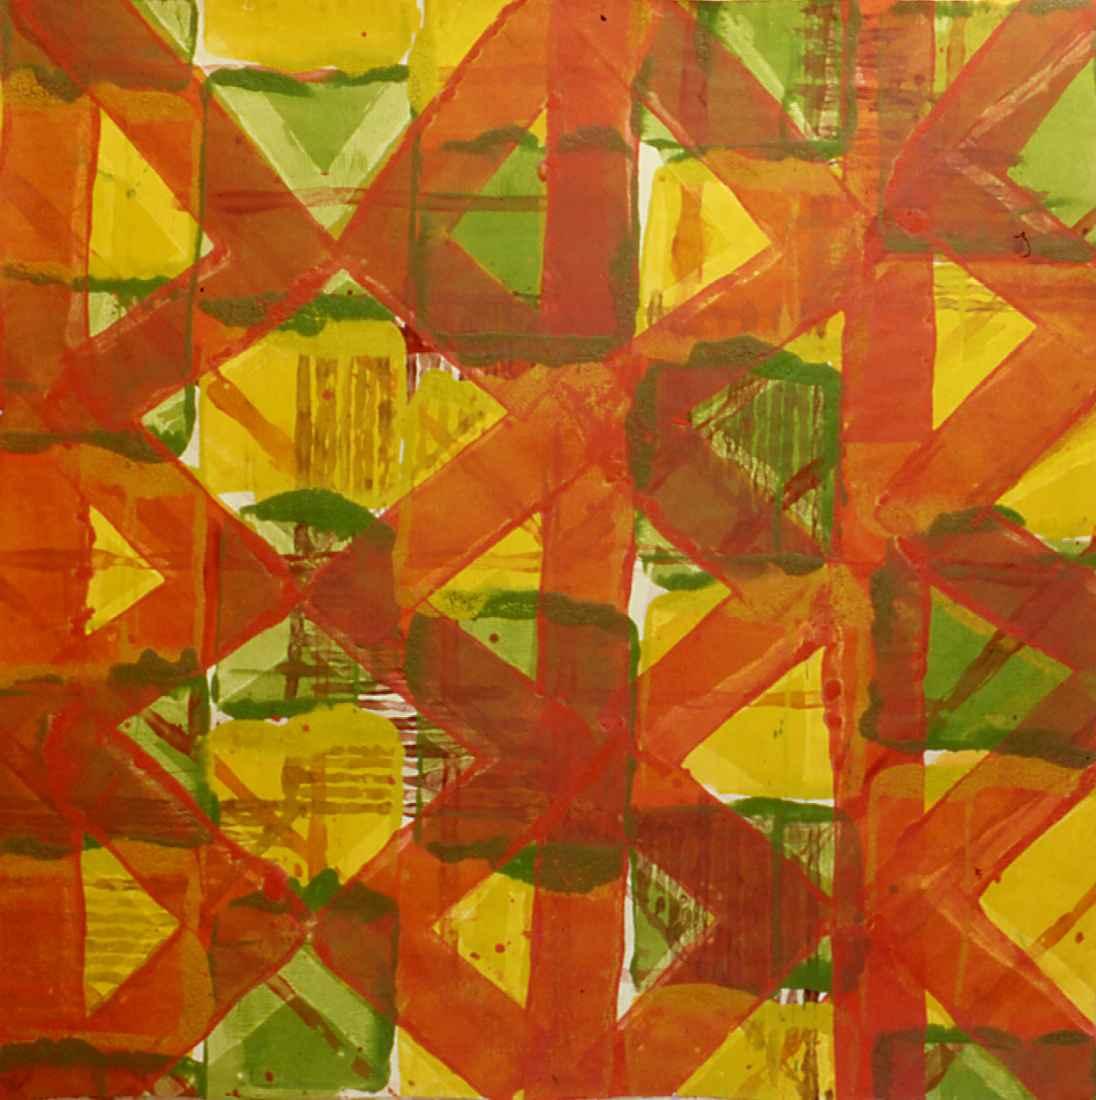 Kapa 53 by  Brendt Berger - Masterpiece Online